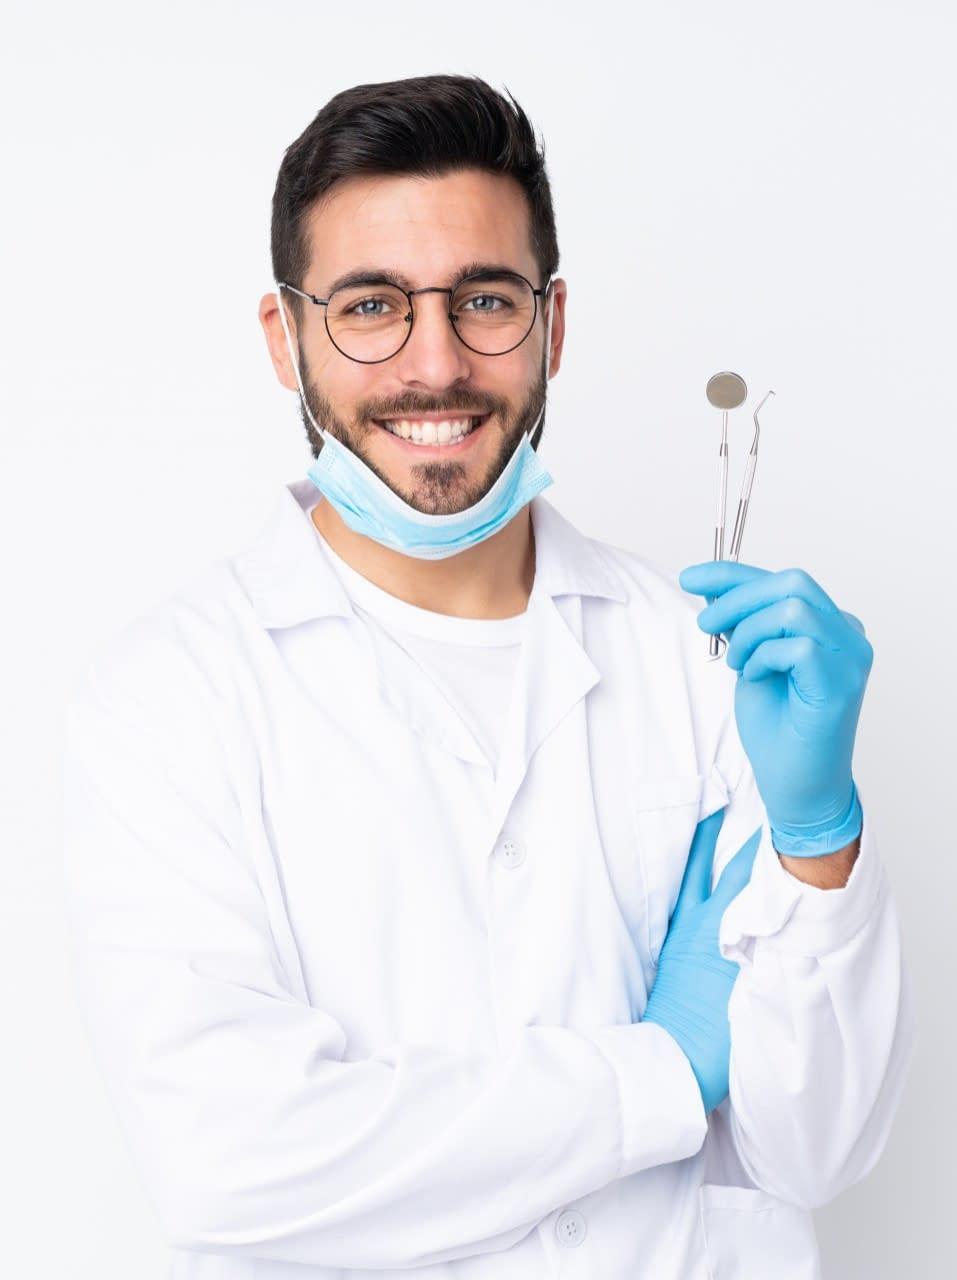 Digital Marketing for Dentists-Dental guy holding instruments